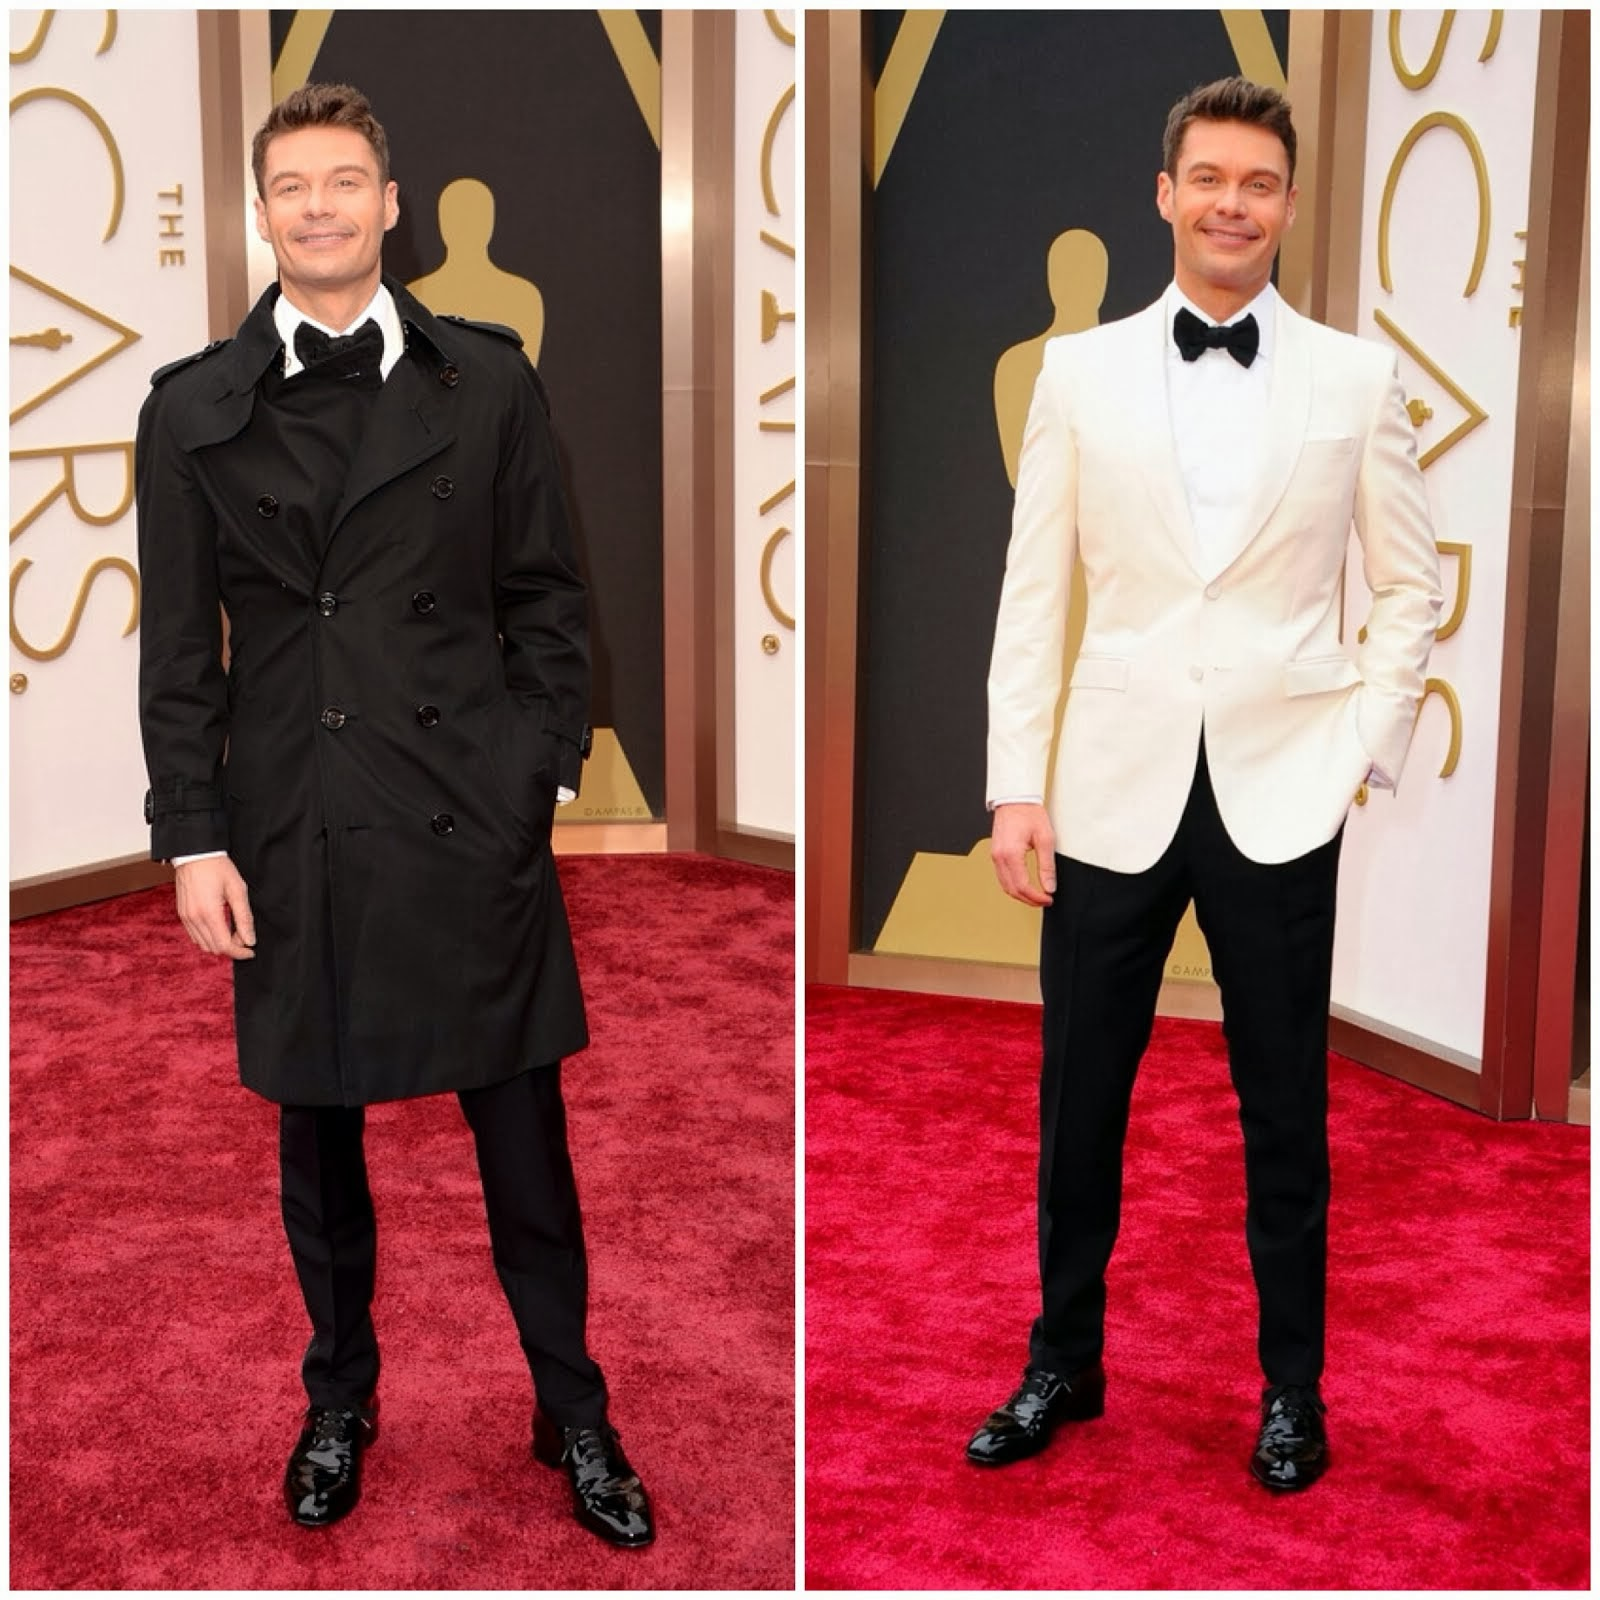 Ryan Seacrest in Burberry - 86th Annual Academy Awards